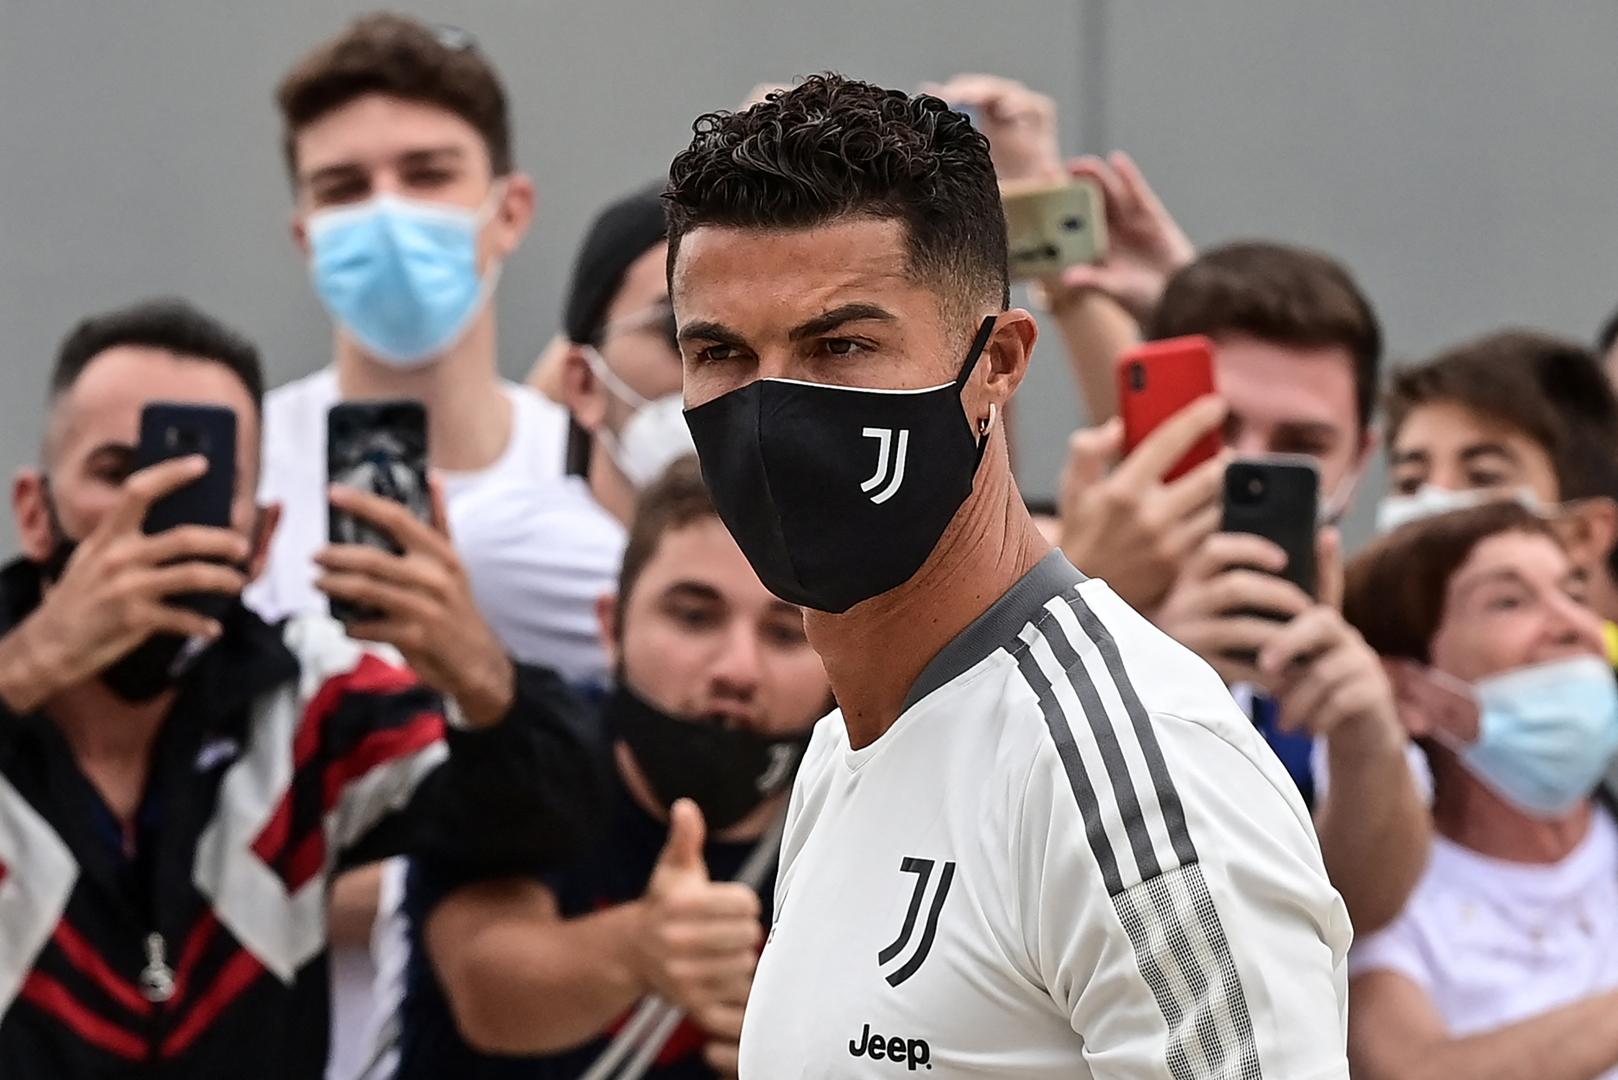 Possible venues for Ronaldo .. Arab League and Paris